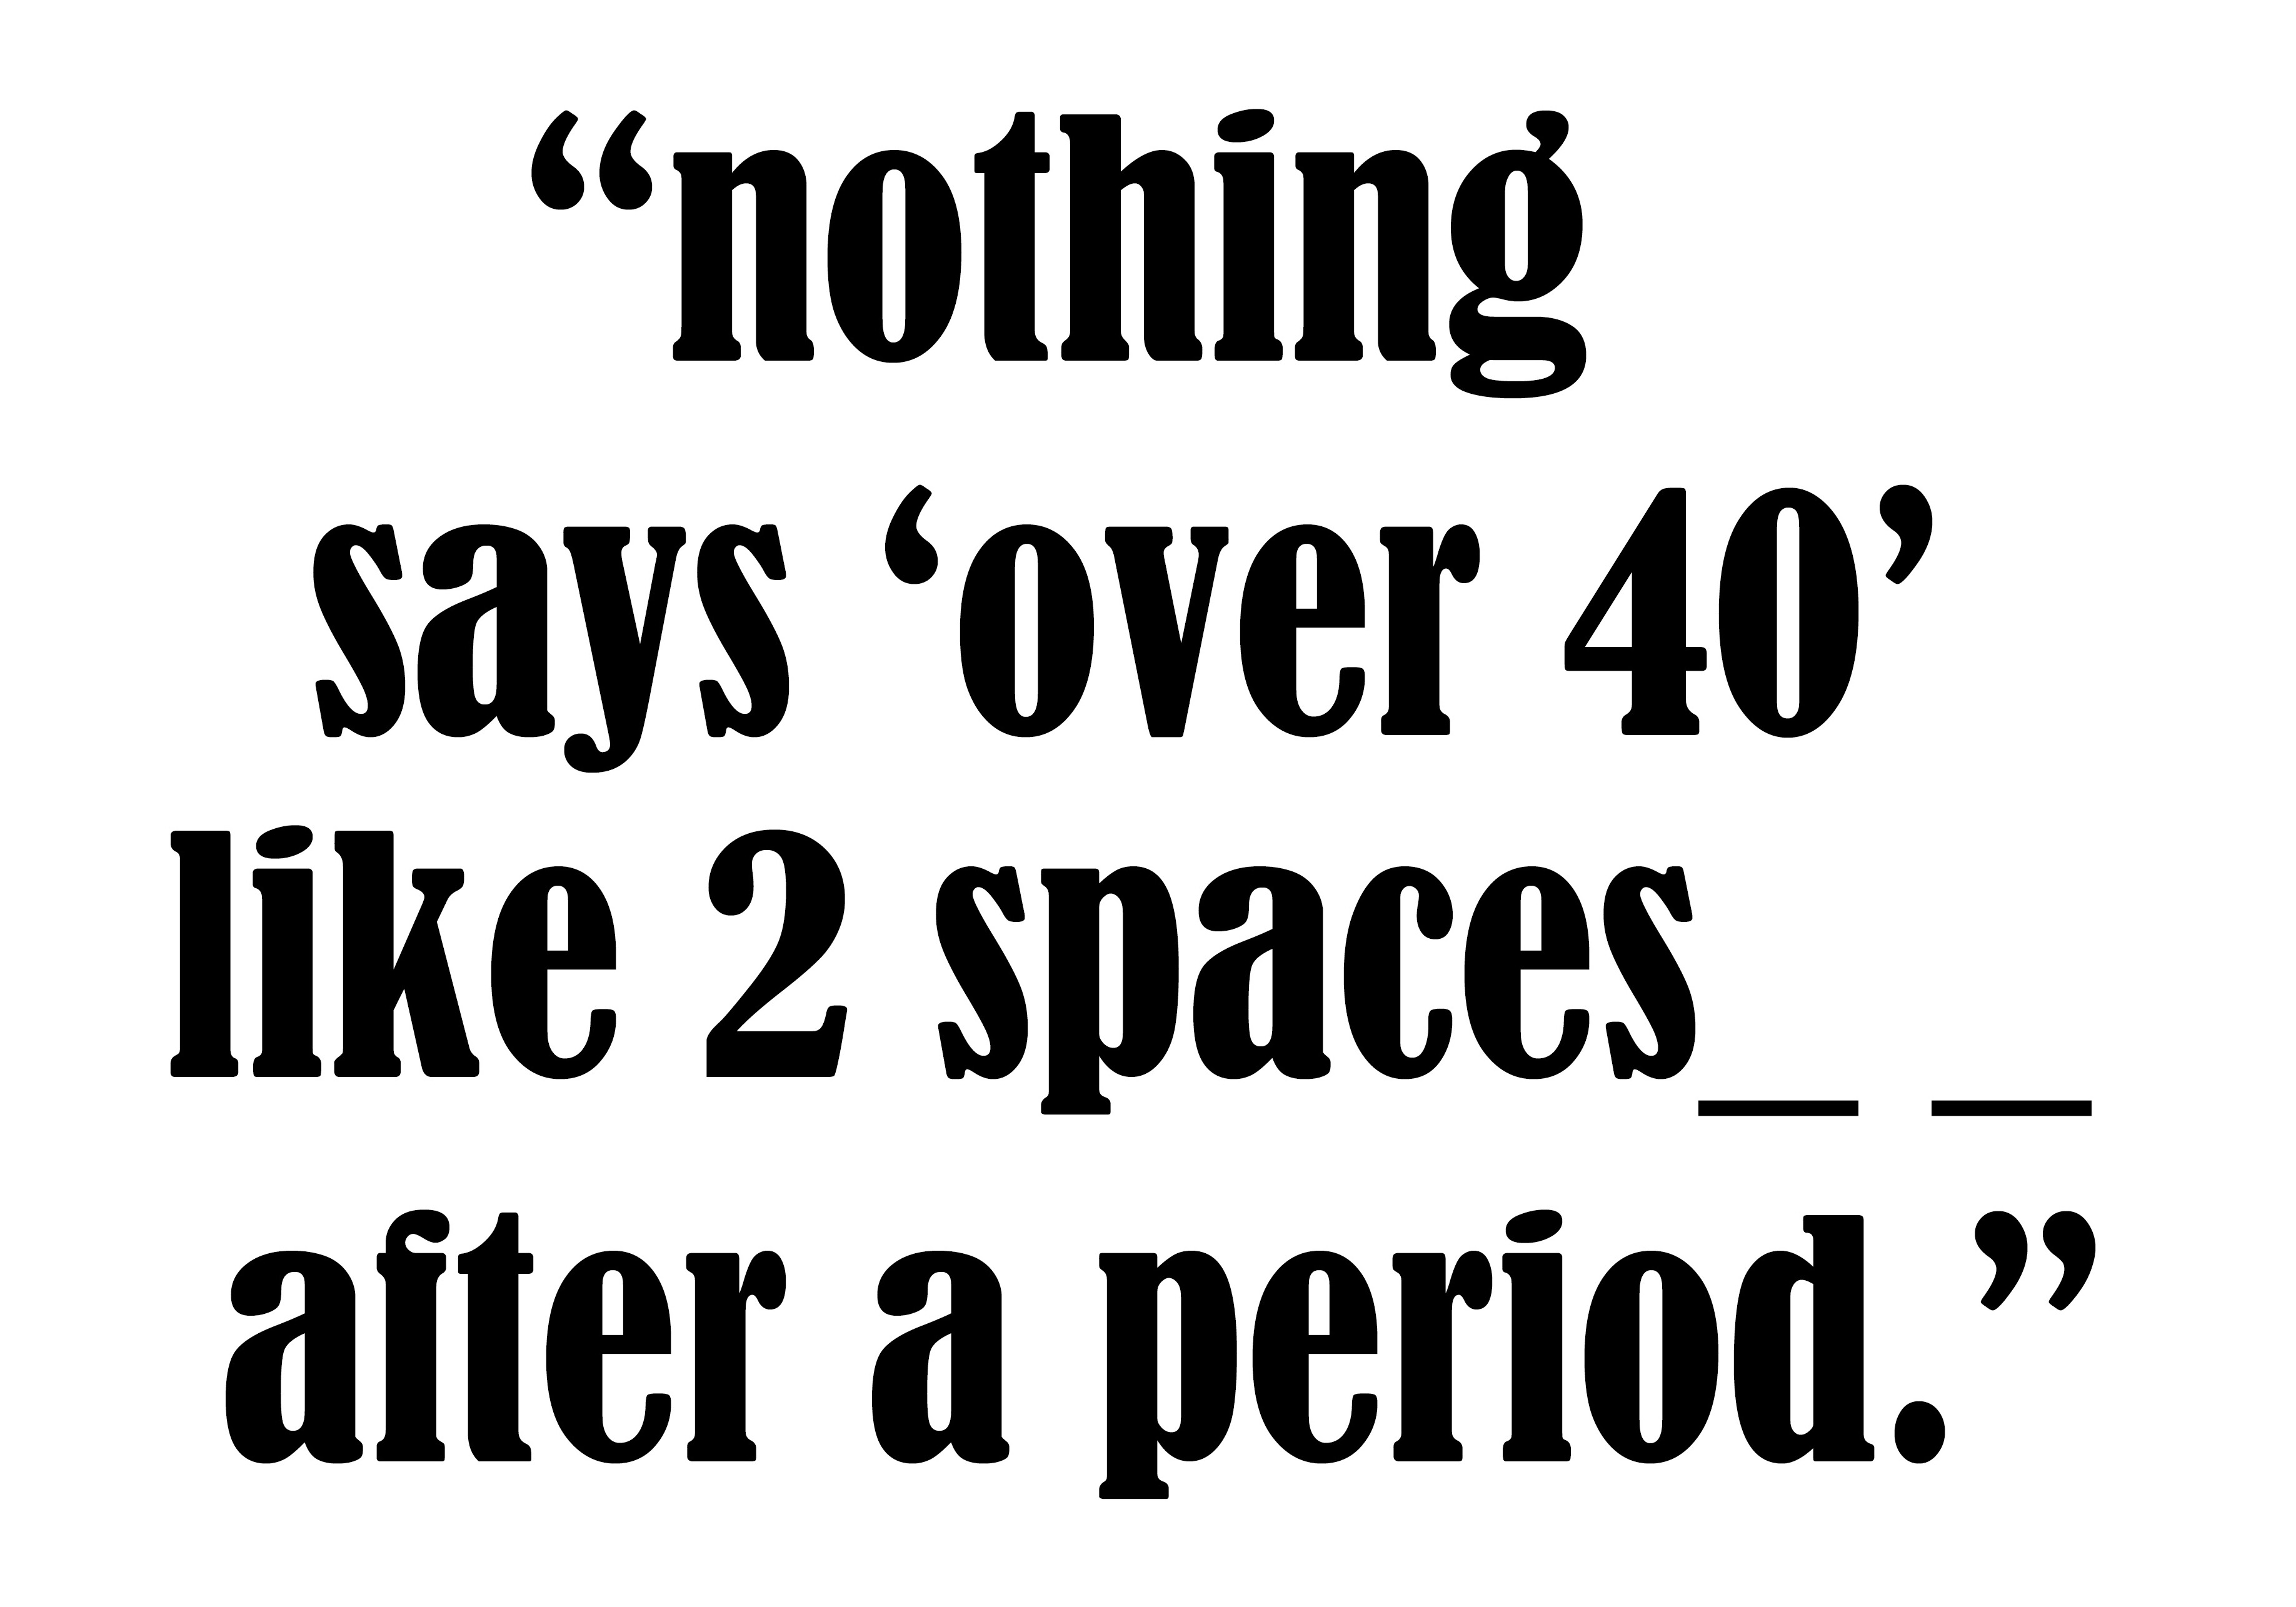 2 spaces copy